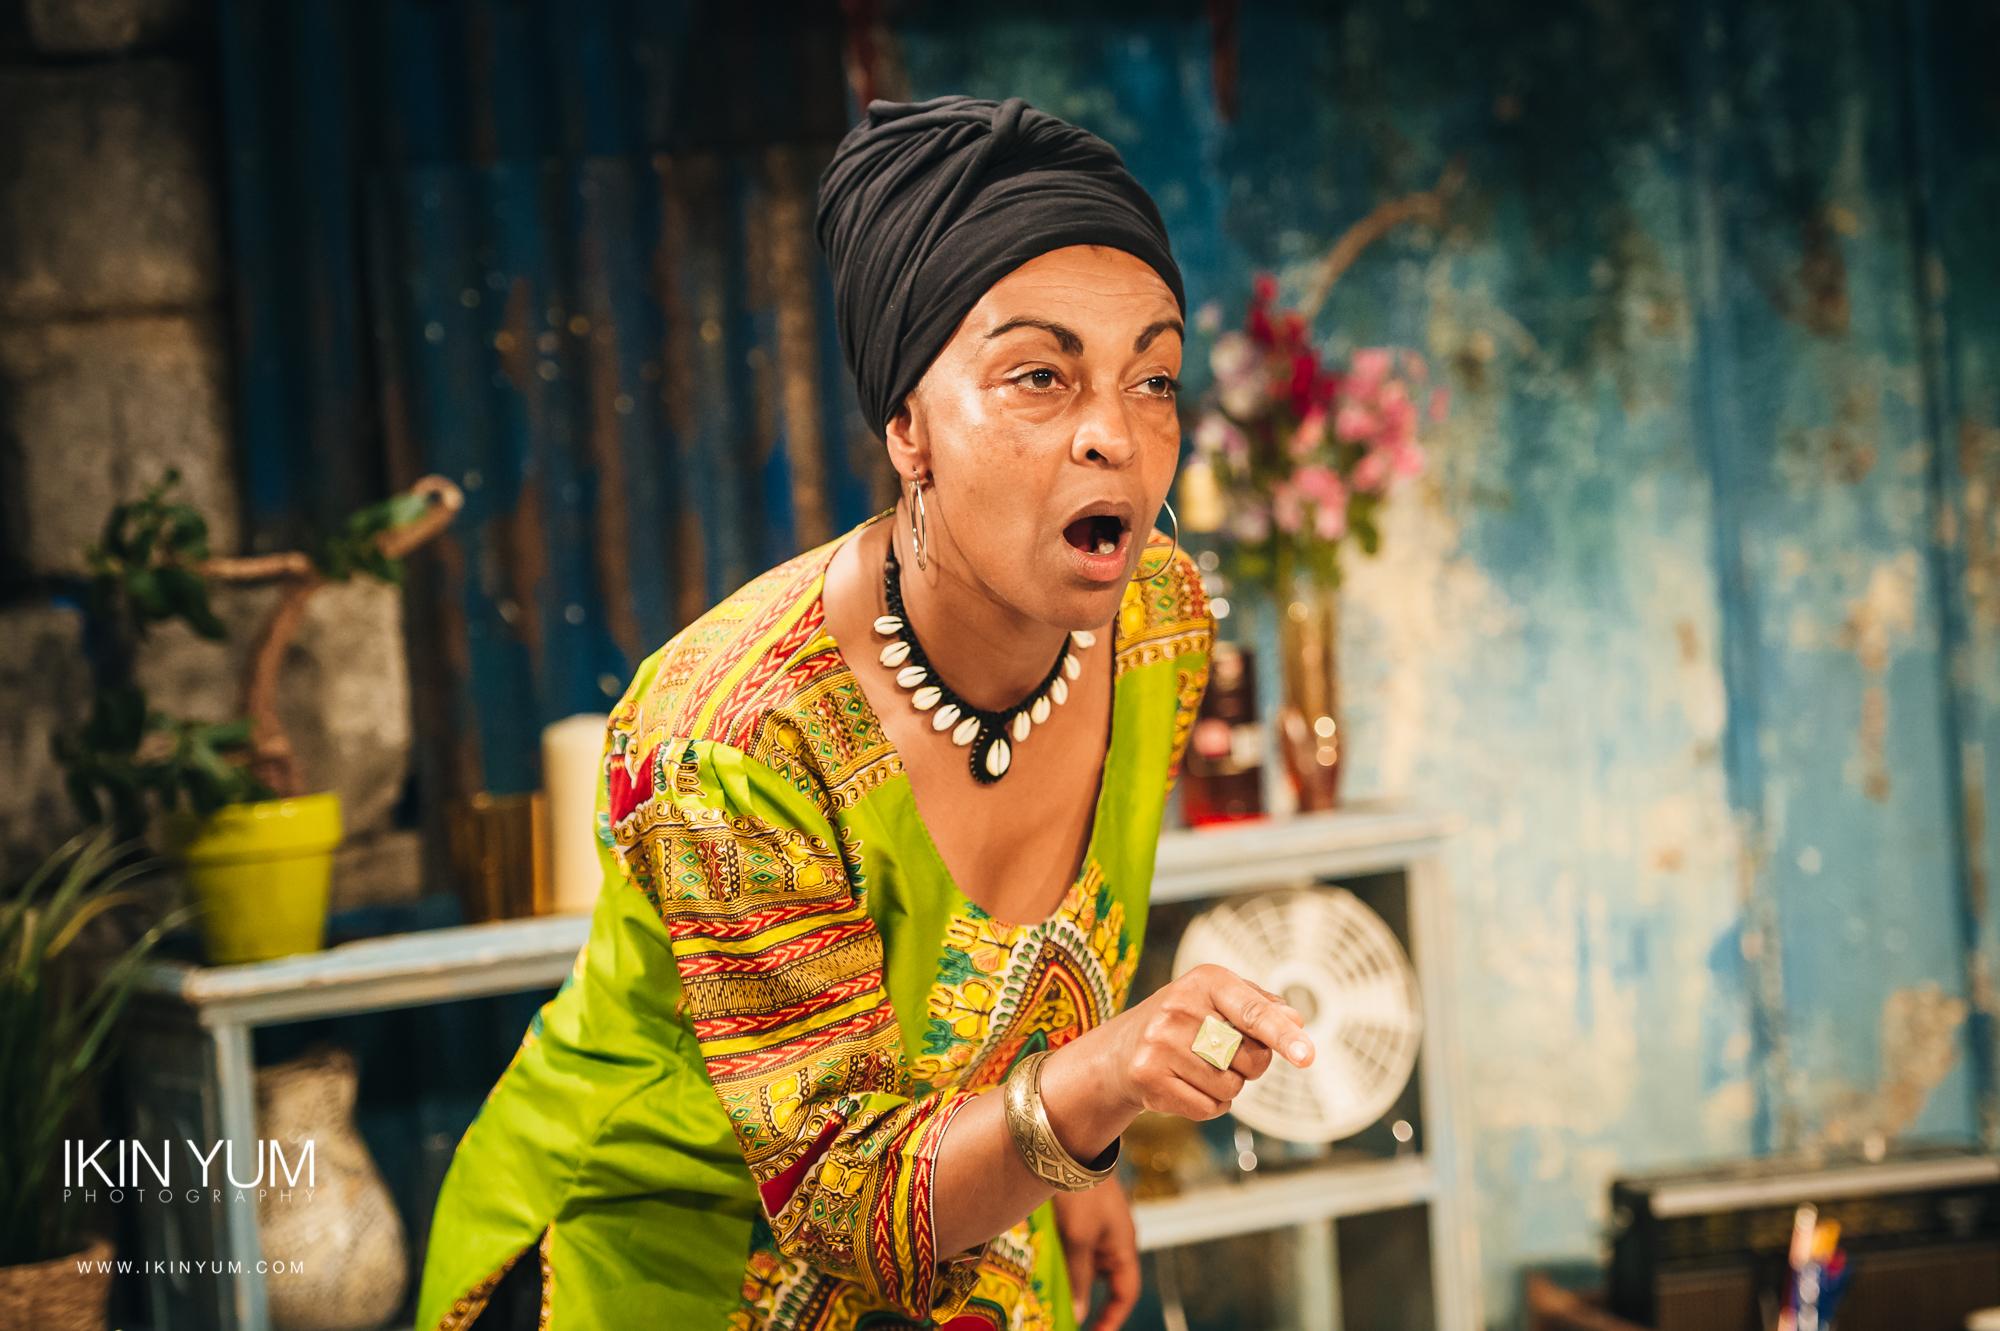 Assata Taught Me - Gate Theatre - Ikin Yum Photography-073.jpg